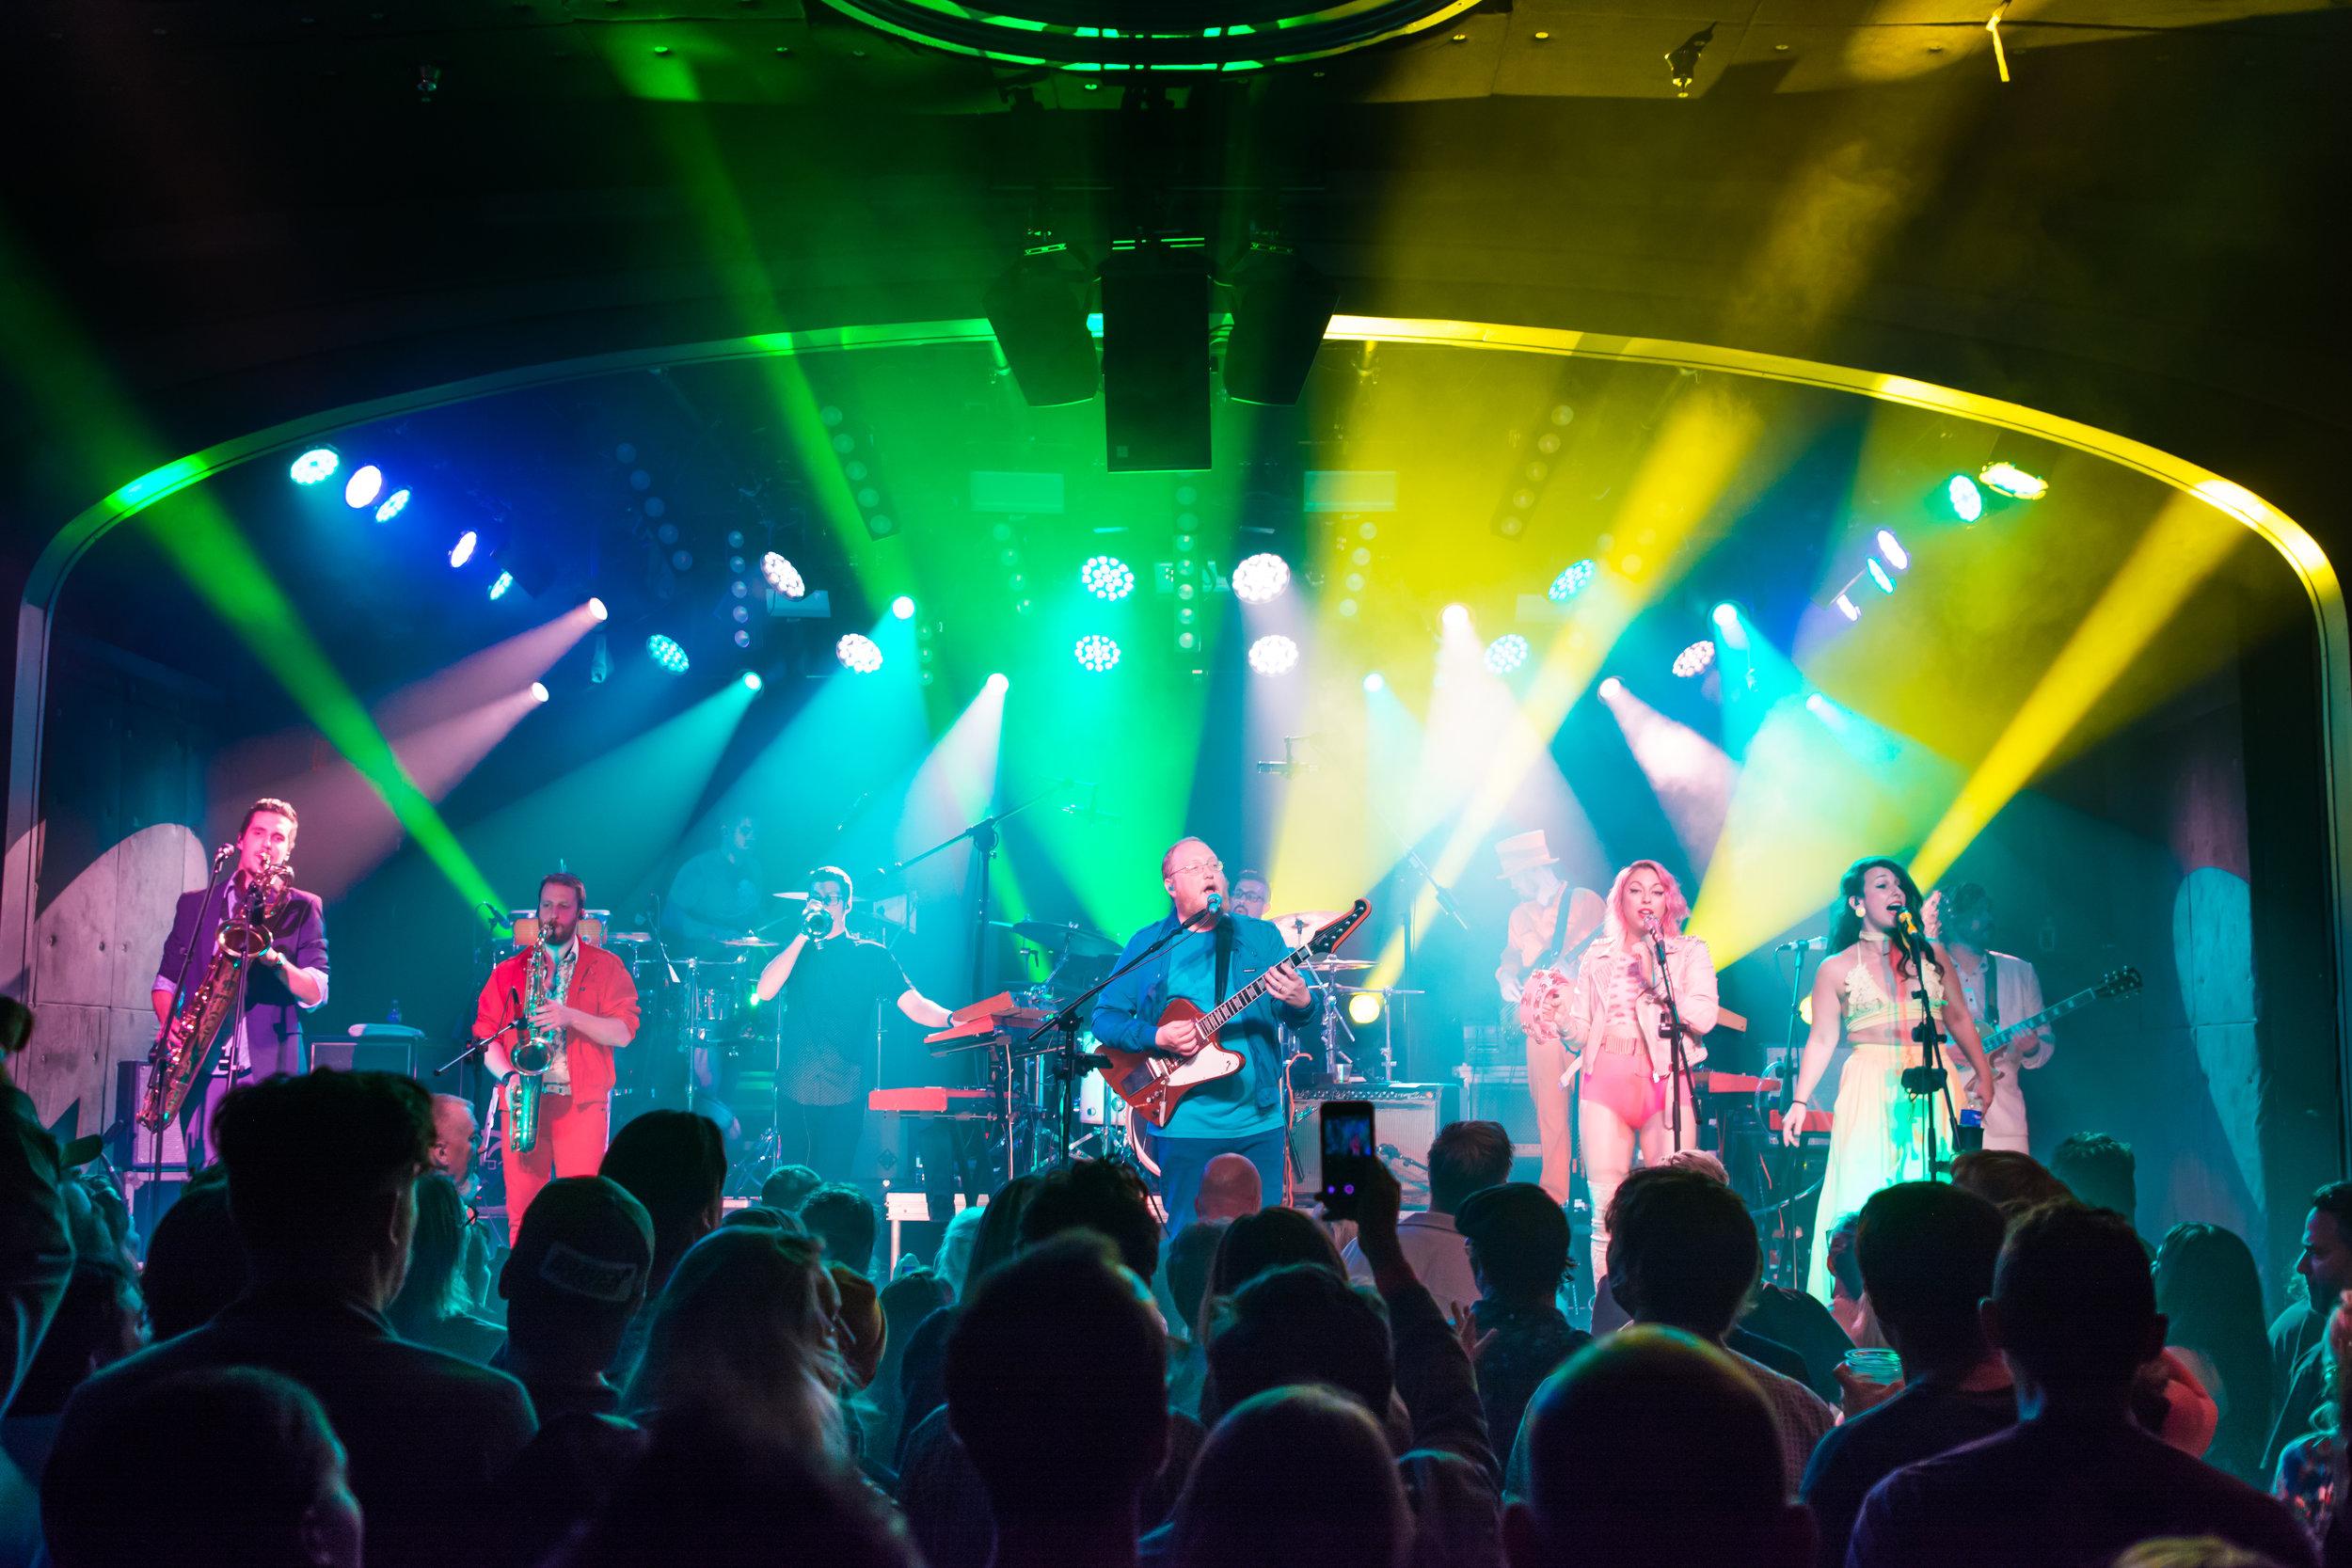 Turkuoz & New Mastersounds - The Teragram Ballroom | November 10, 2016